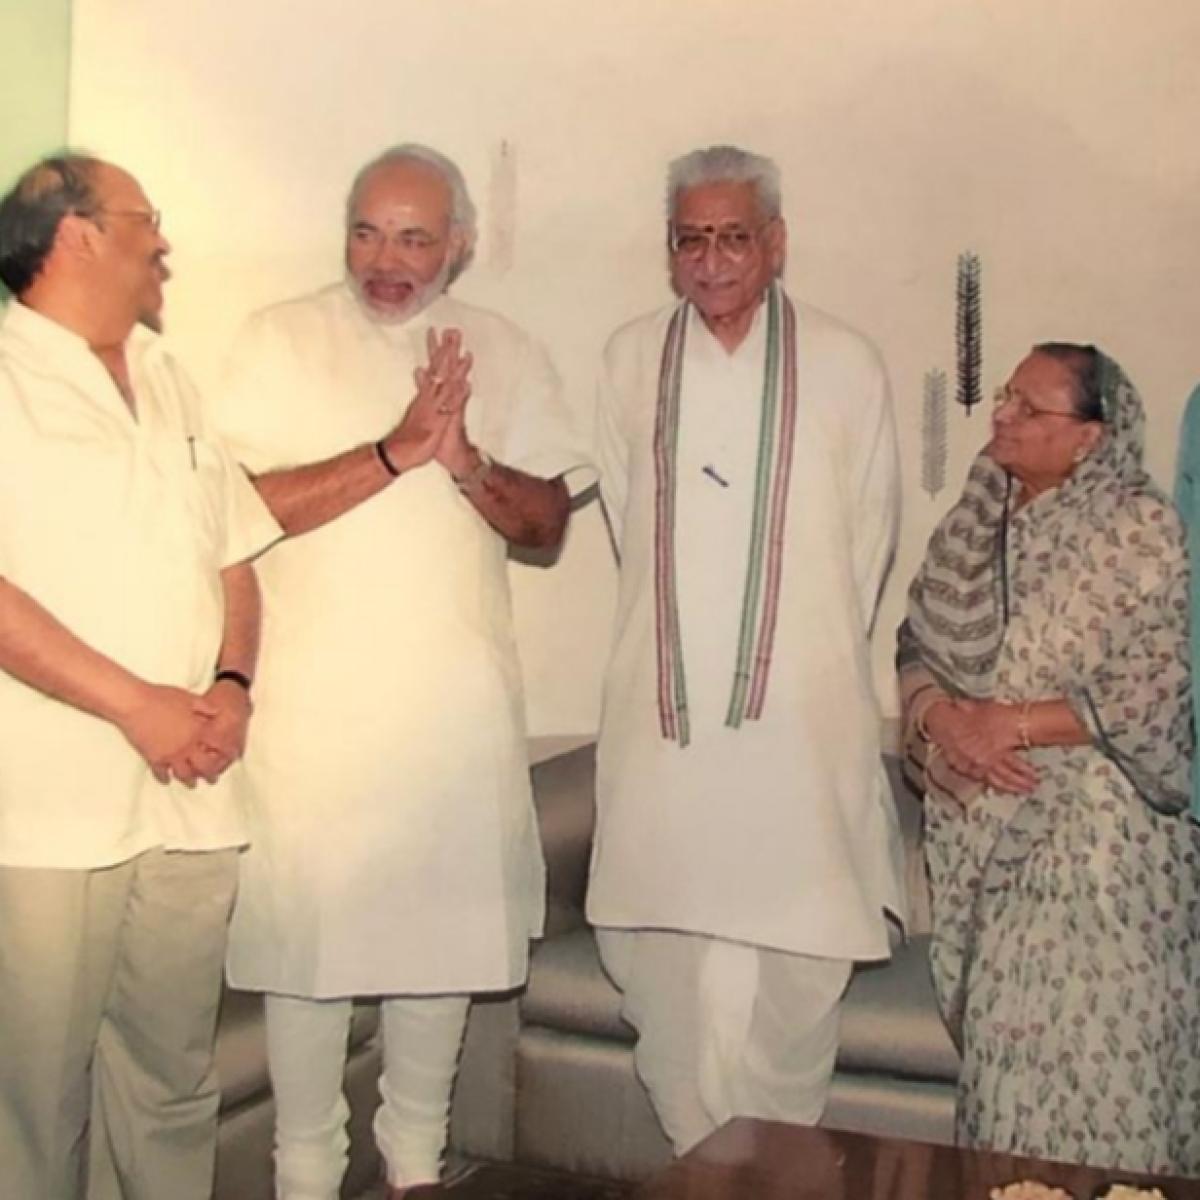 Ayodhya Bhoomi Pujan: VHP leader Ashok Singhal's nephew Salil to be 'Mukhya Yajman' at the foundation event